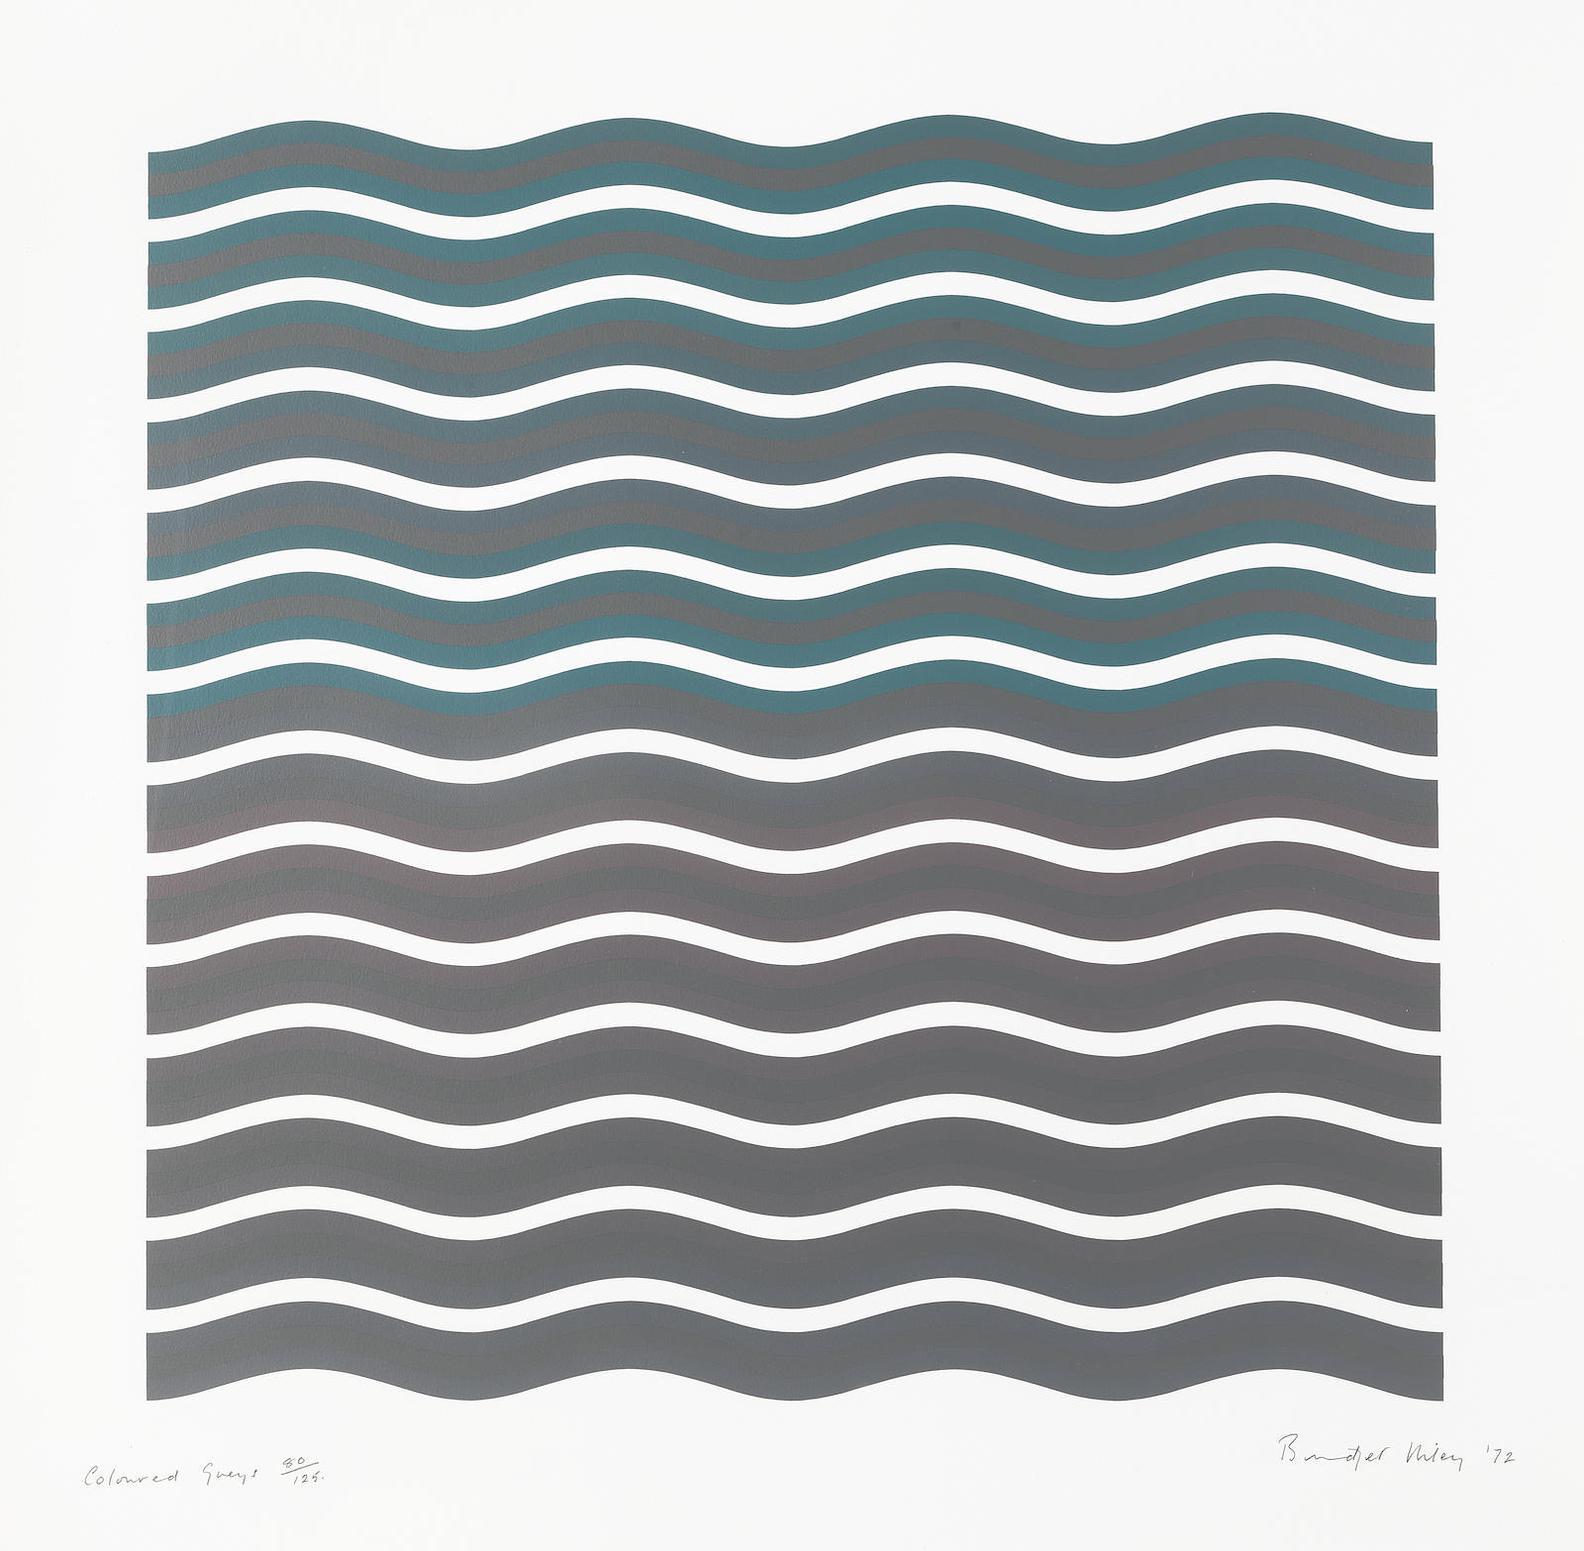 Bridget Riley-Coloured Greys [2] (Schubert 17)-1972